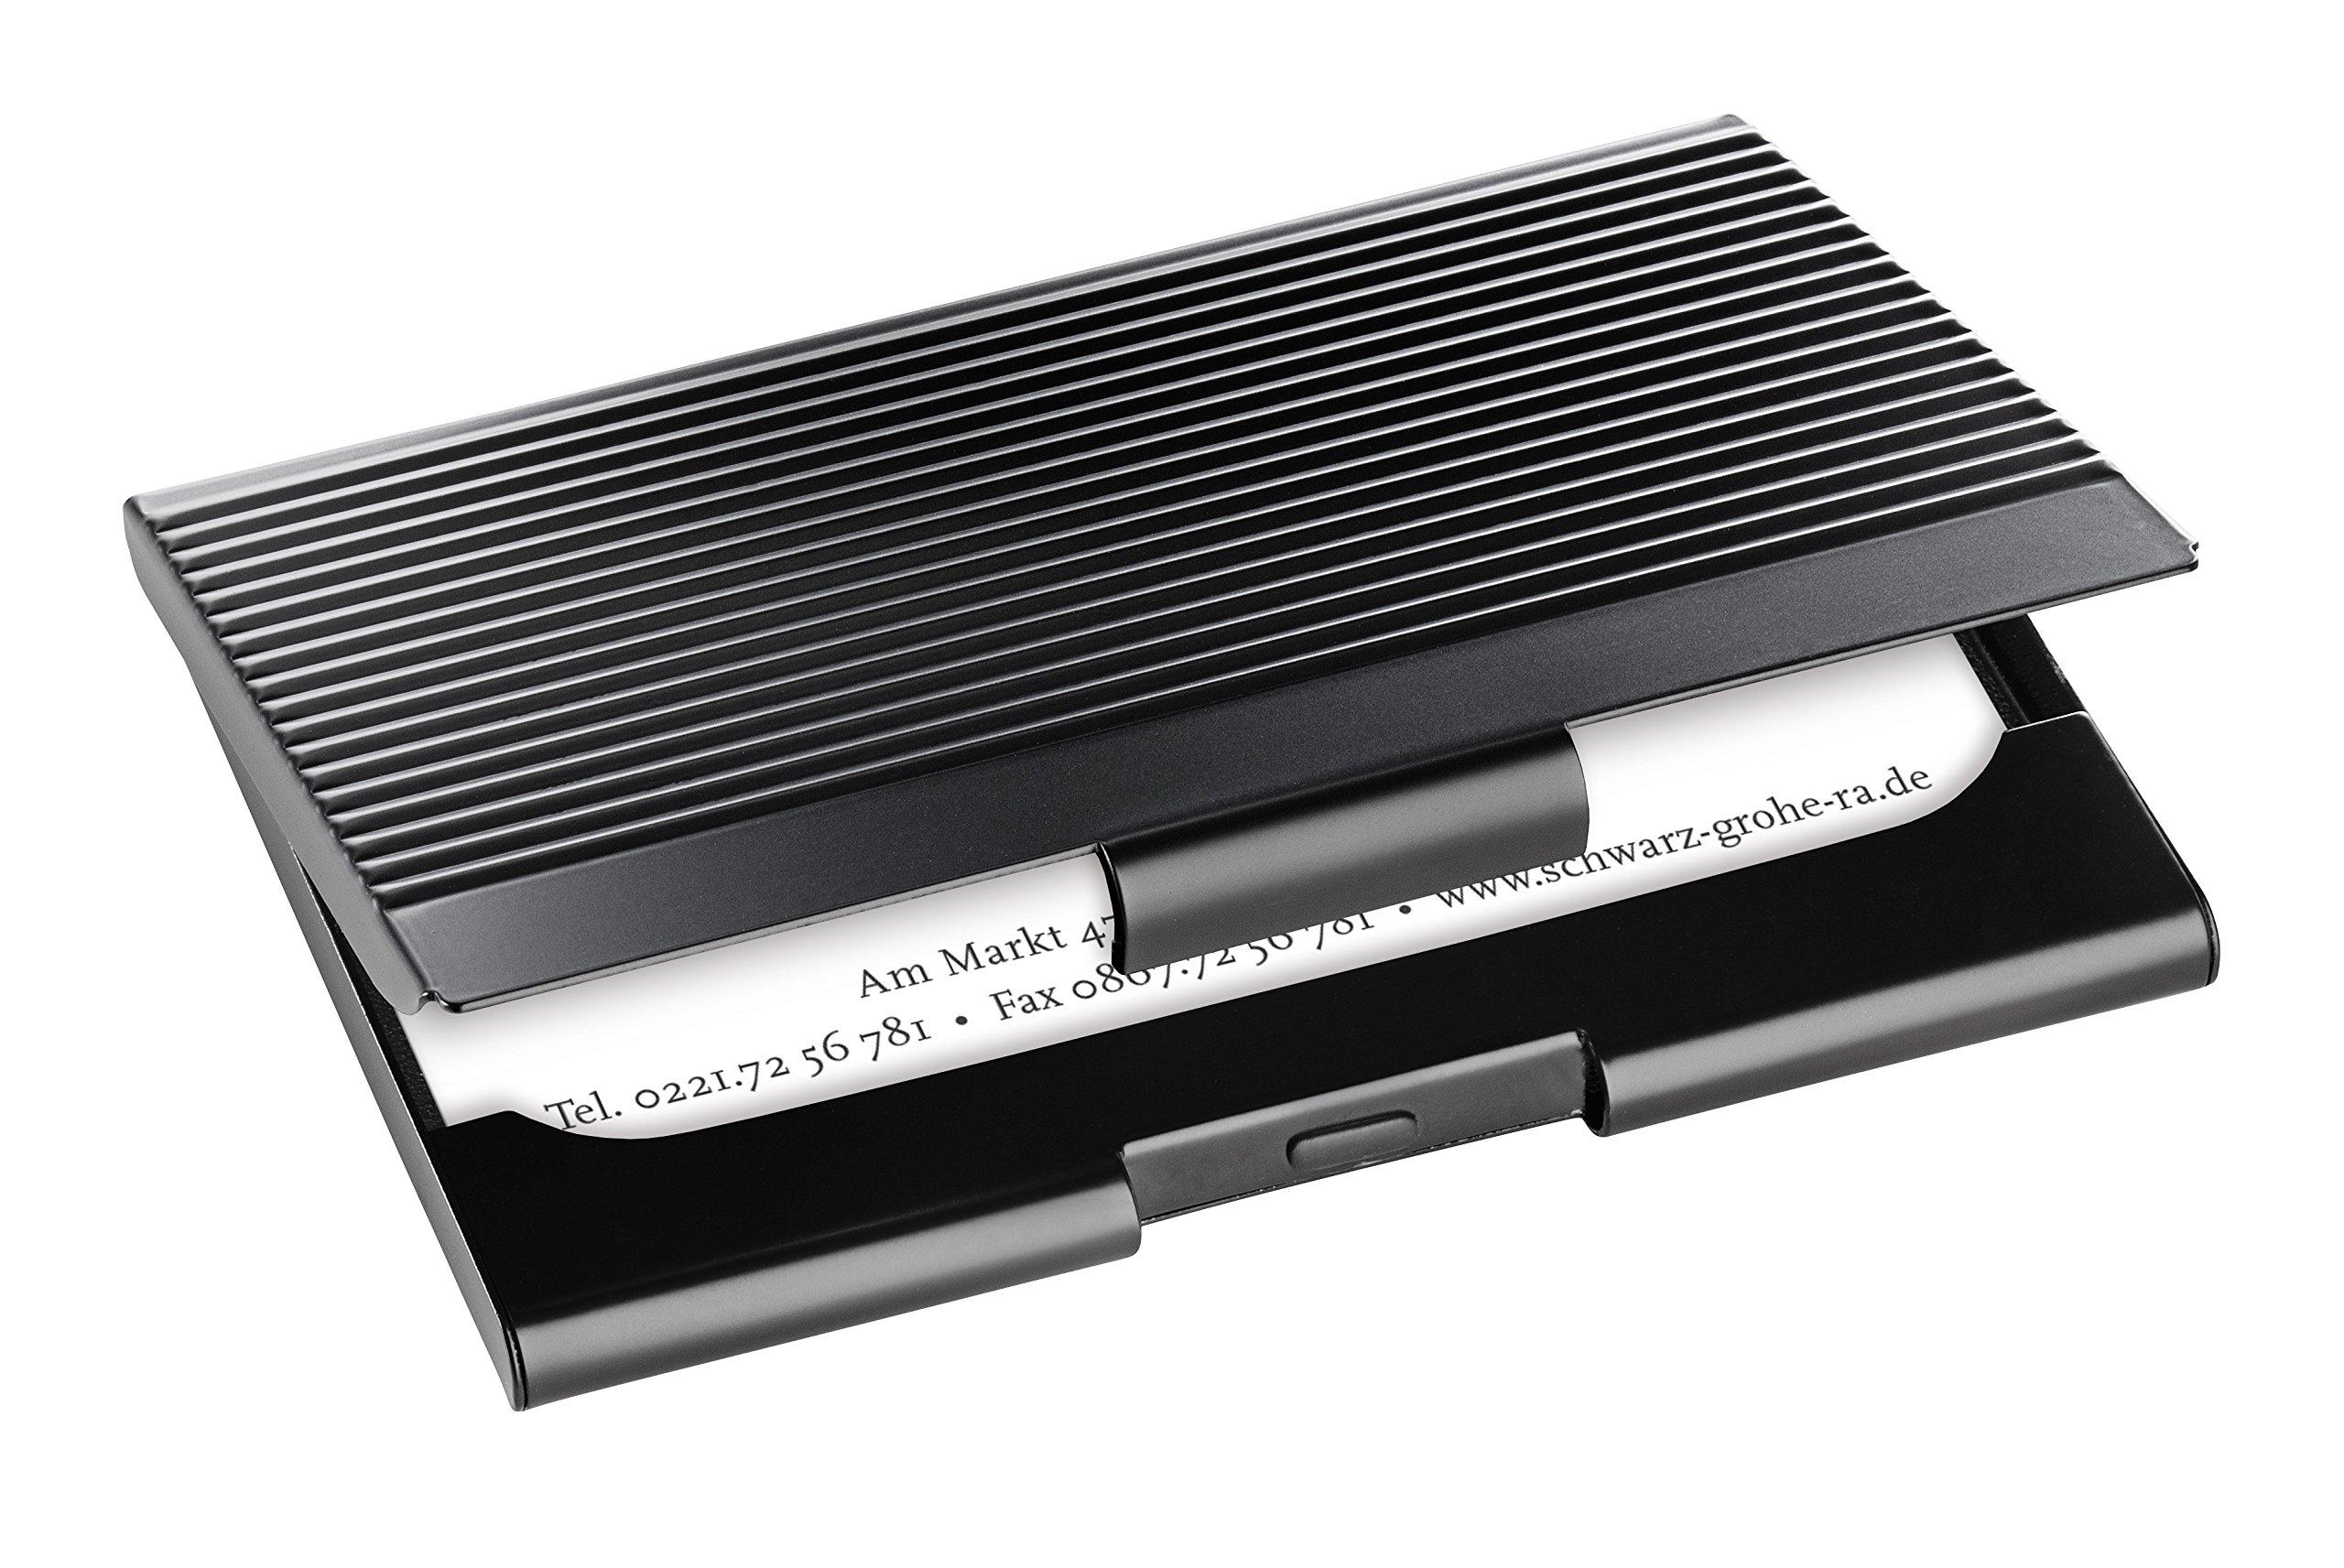 Sigel VZ134 - Porta-tarjetas de visita, superficie metálica rayada, para 12 tarjetas